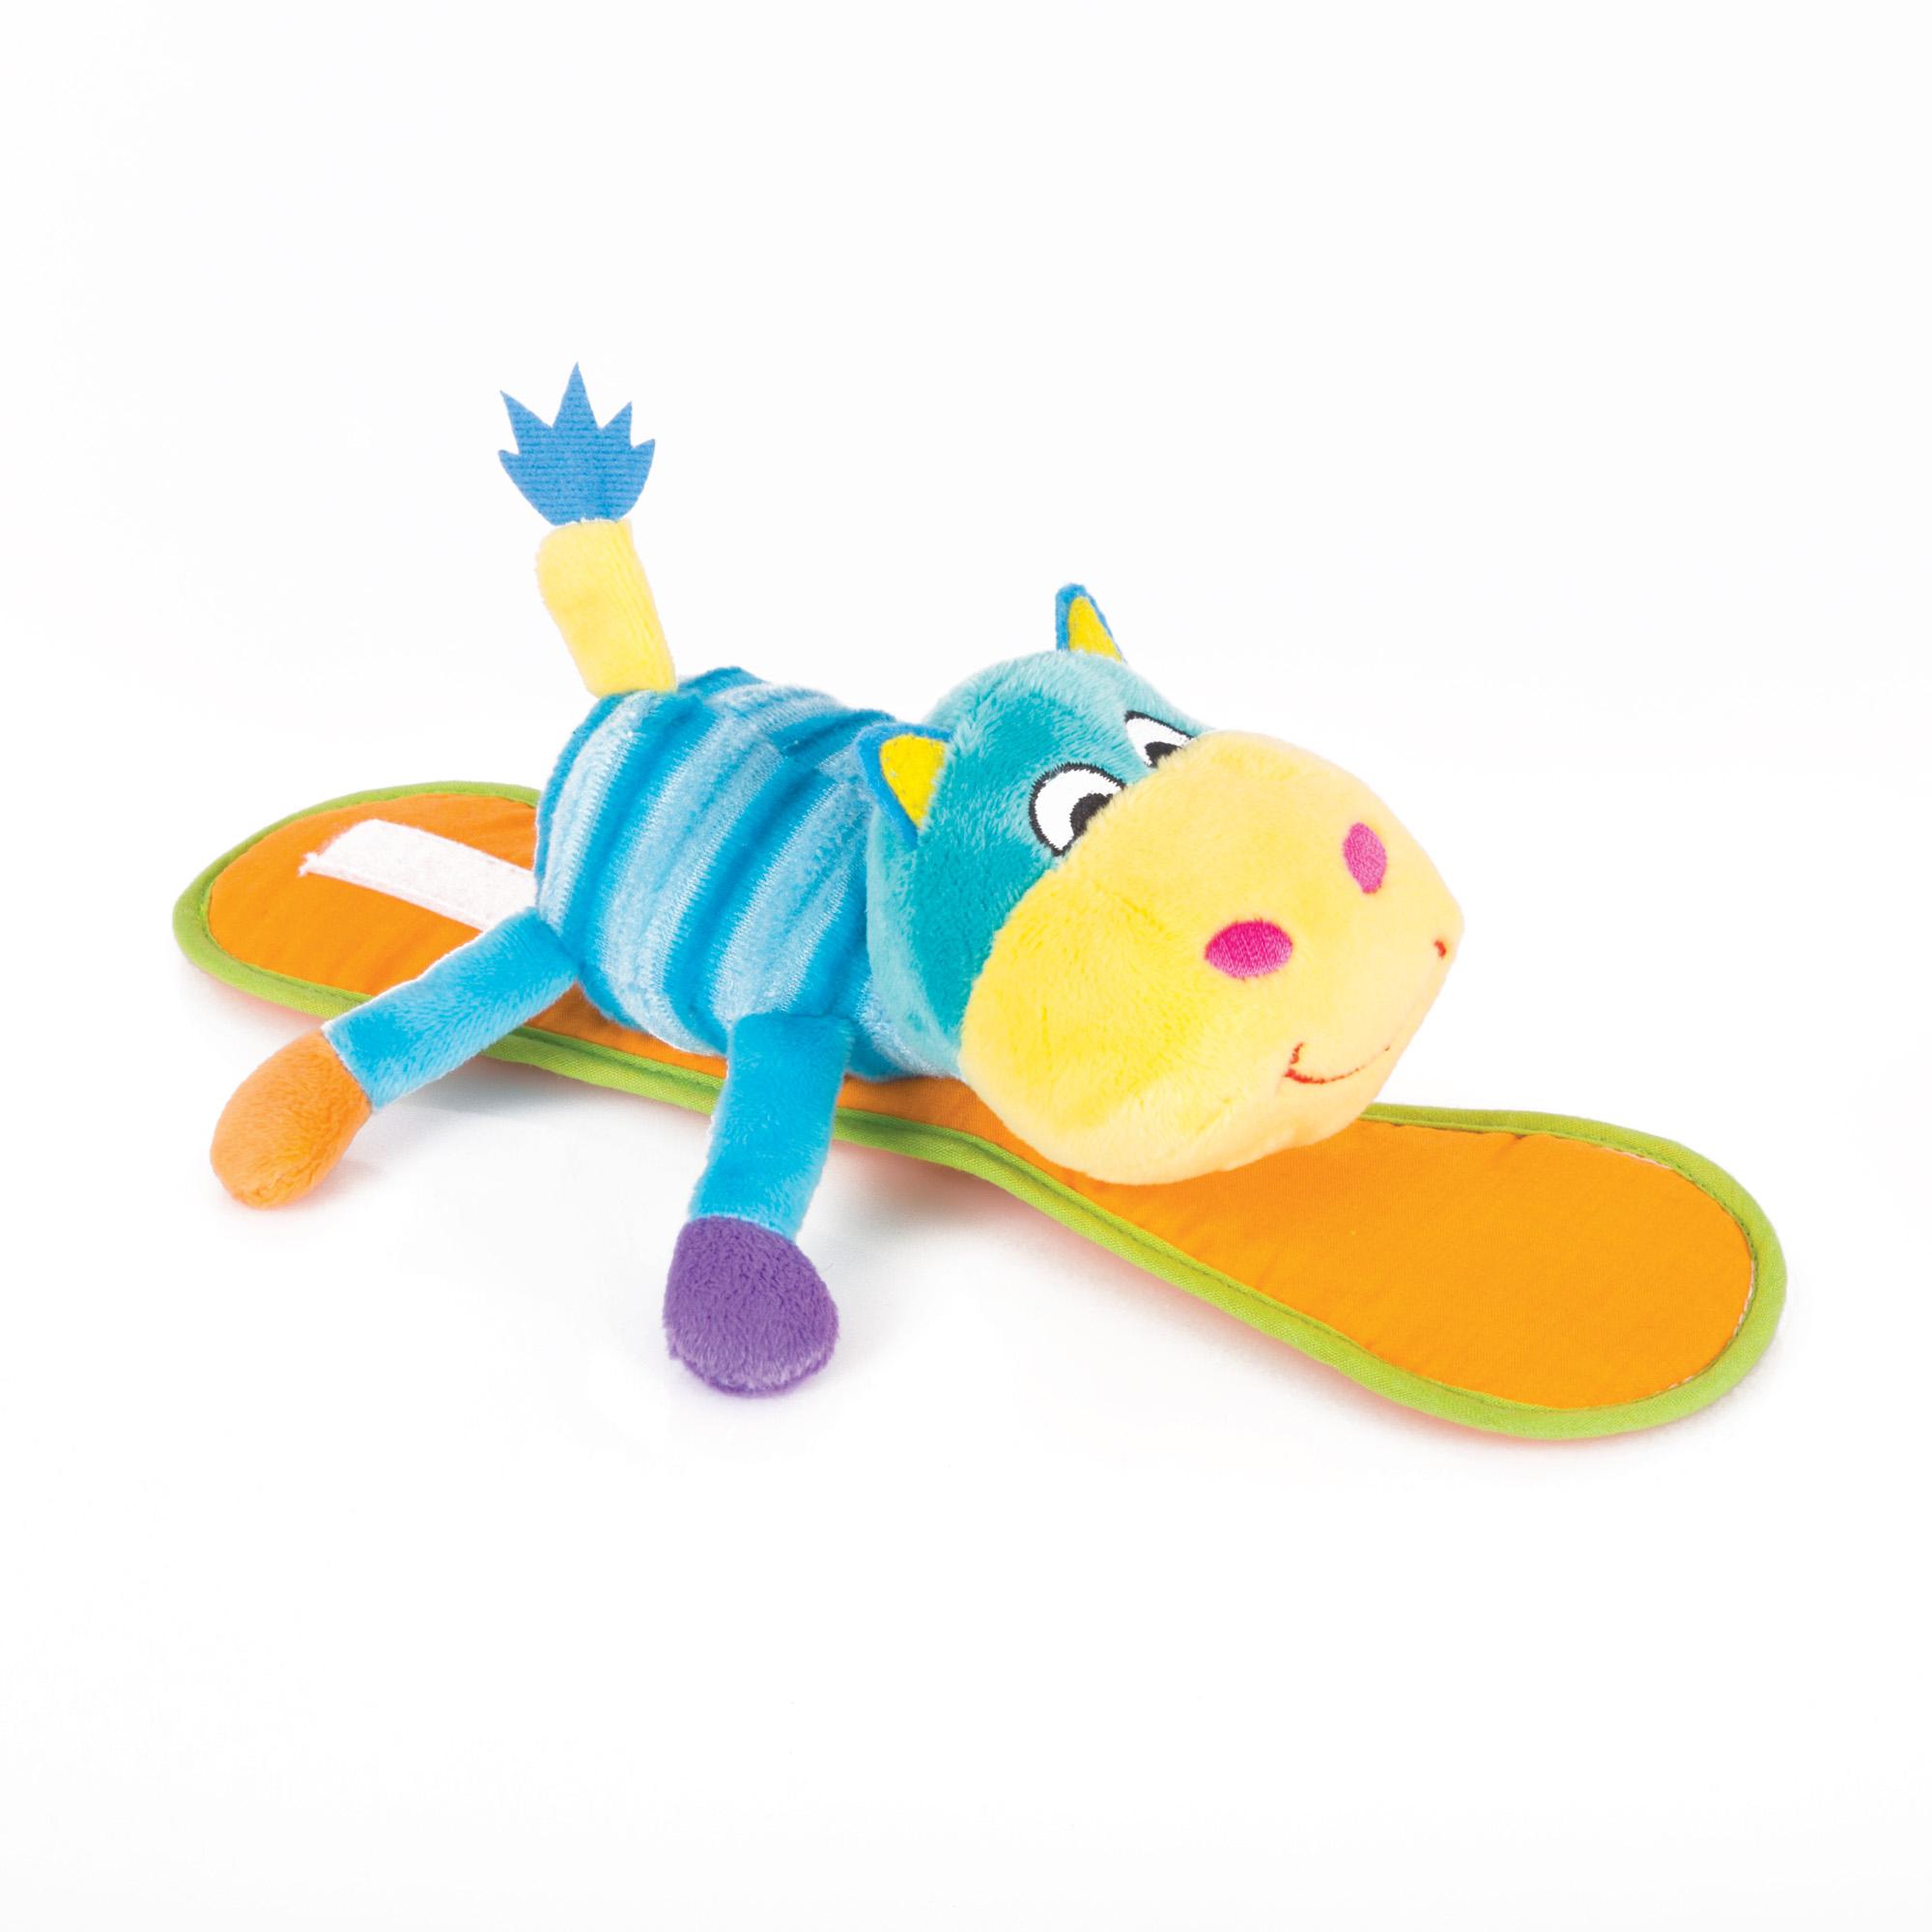 Погремушка Happy Snail Бегемот Бубба 14HSK03BU цены онлайн